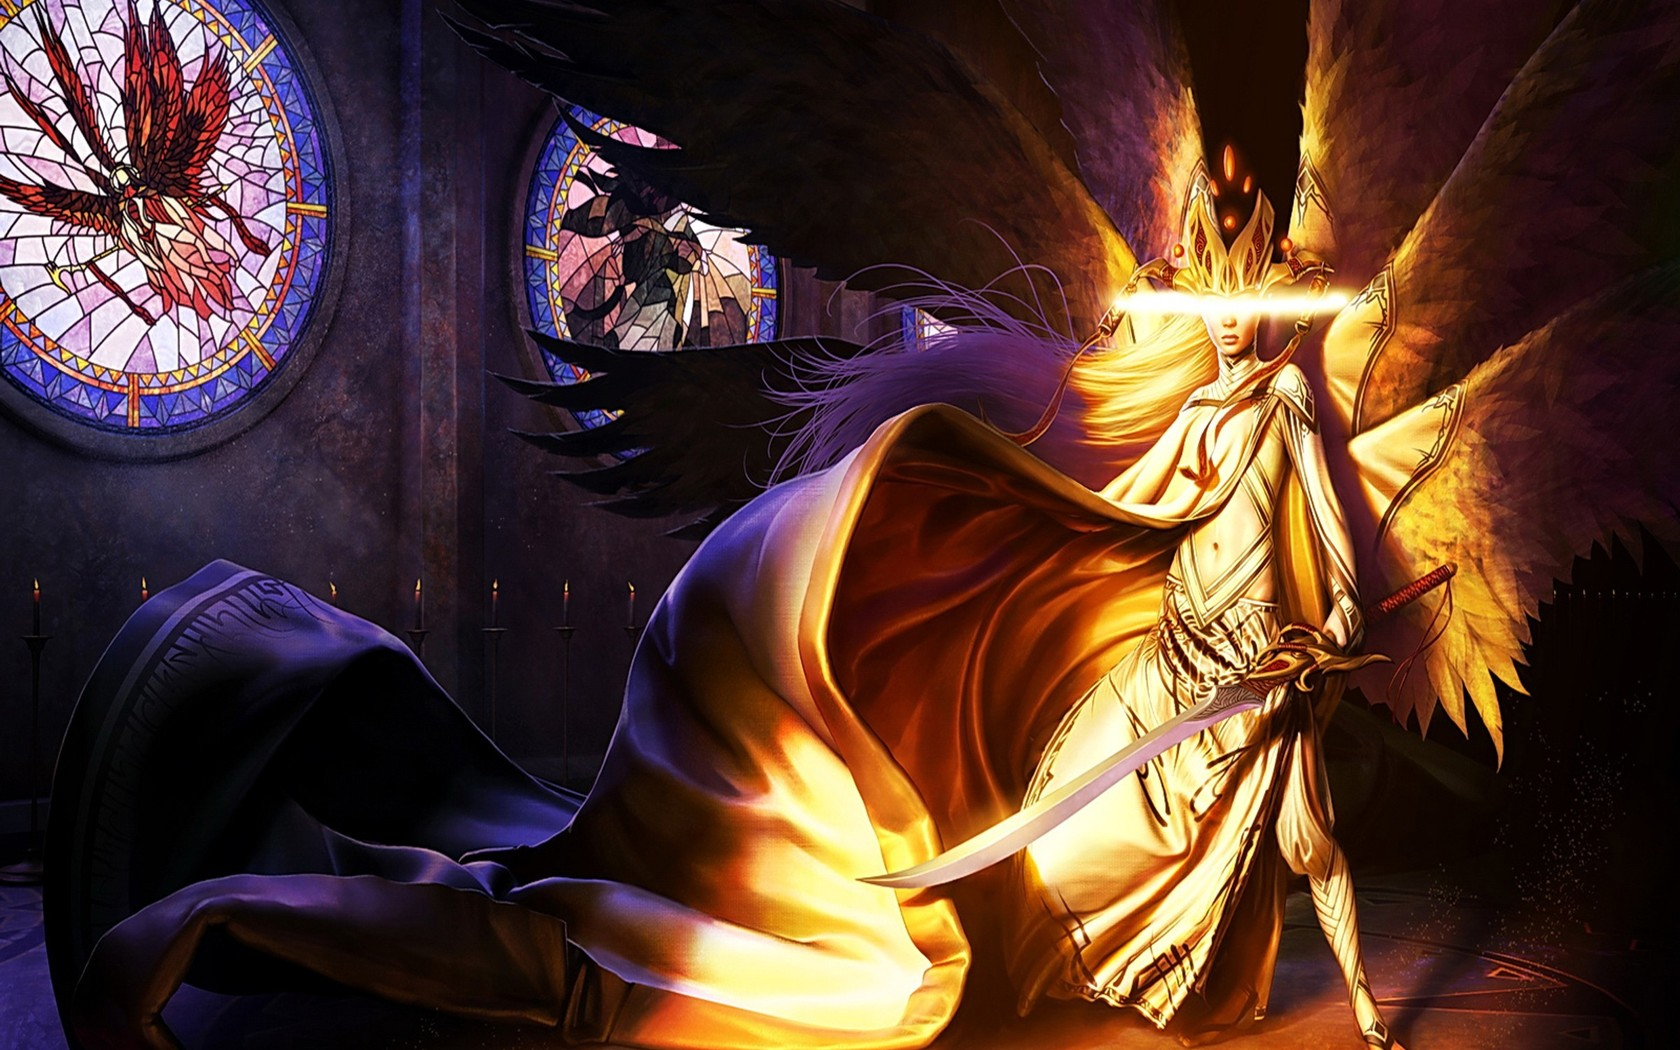 Archangel Michael Hd Wallpaper Fire Angel Warrior Wallpaper And Background Image